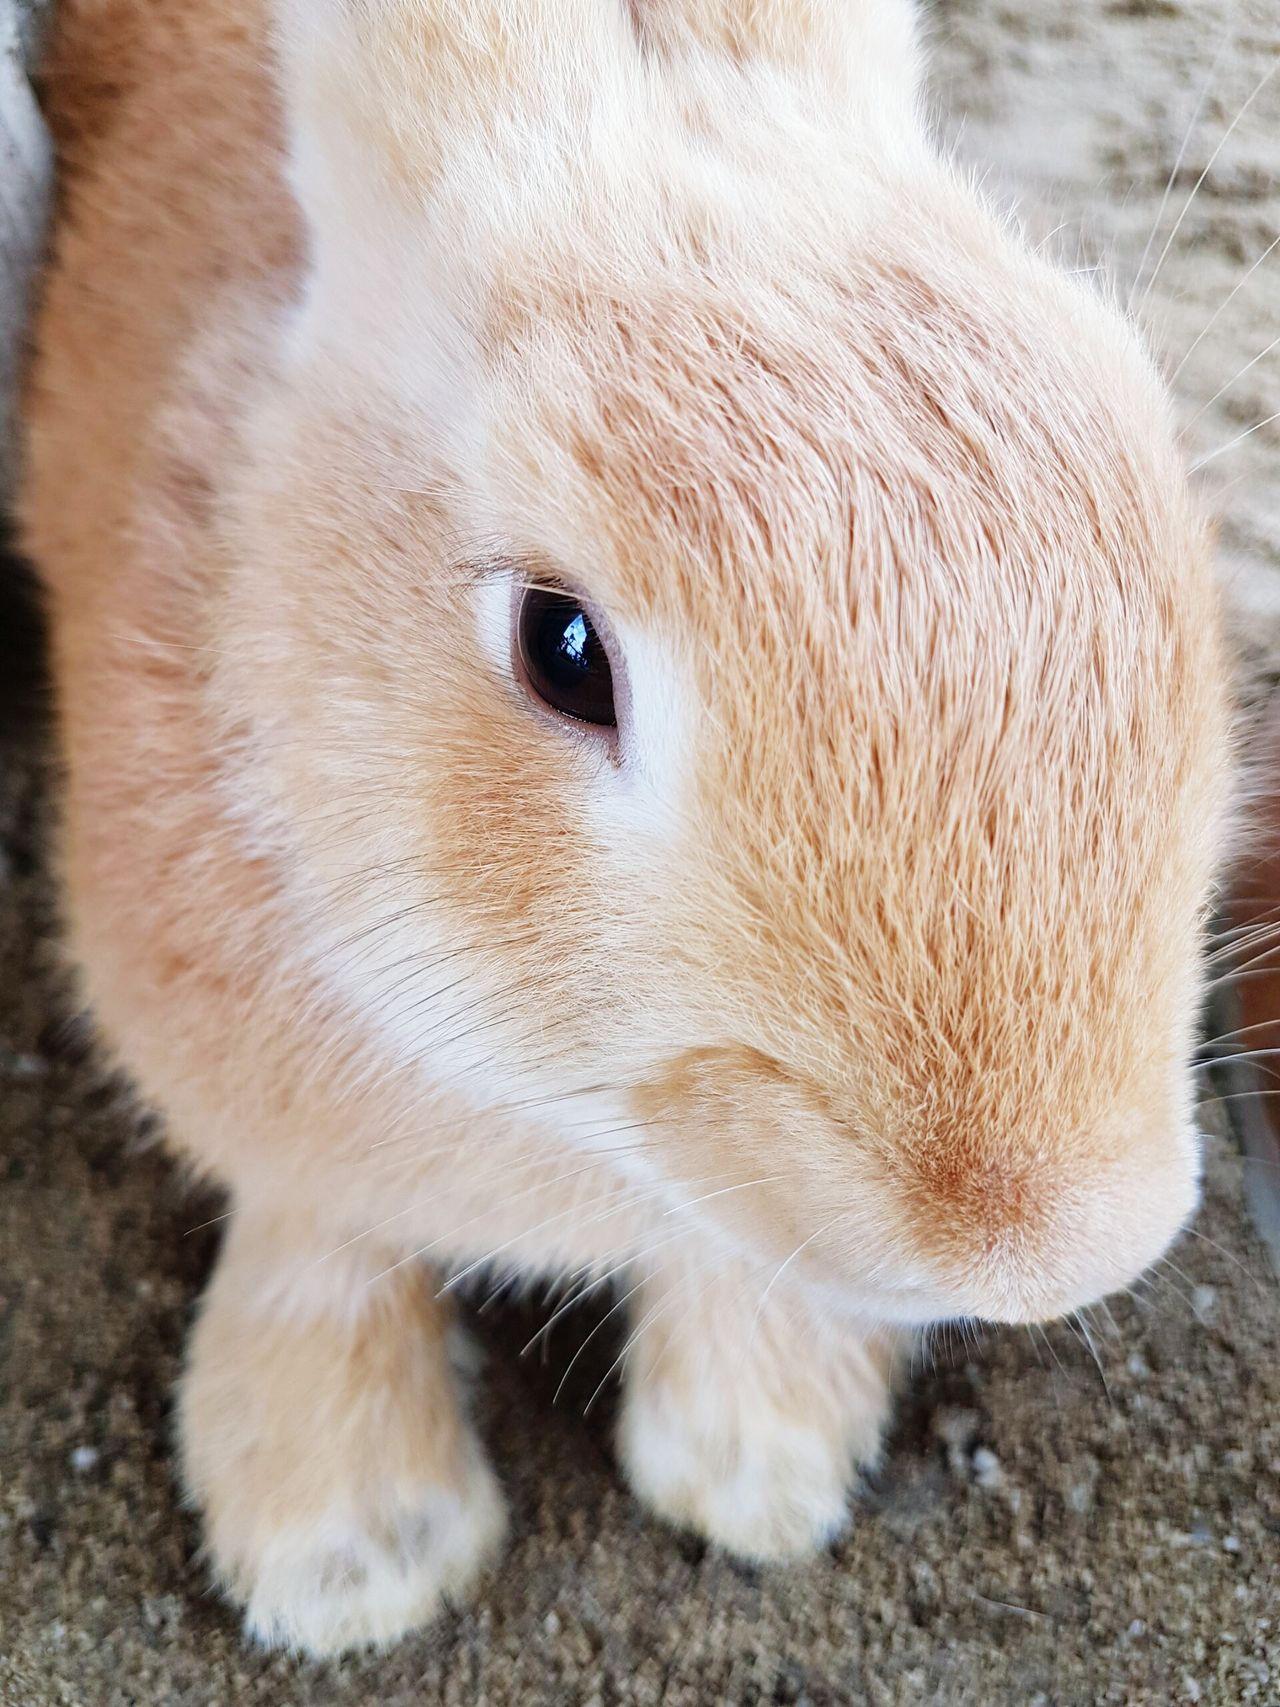 One Animal Animal Themes Close-up Animal Head  Pets Outdoors Rabbit Rabbits Rabbit ❤️ Rabbits 🐇 Rabbit 🐇 Rabbitsofinstagram Rabbit - Animal Rabbit♡ Rabbit Face Rabbit Portrait Rabbitstagram Rabbit Eye Rabbit Faces